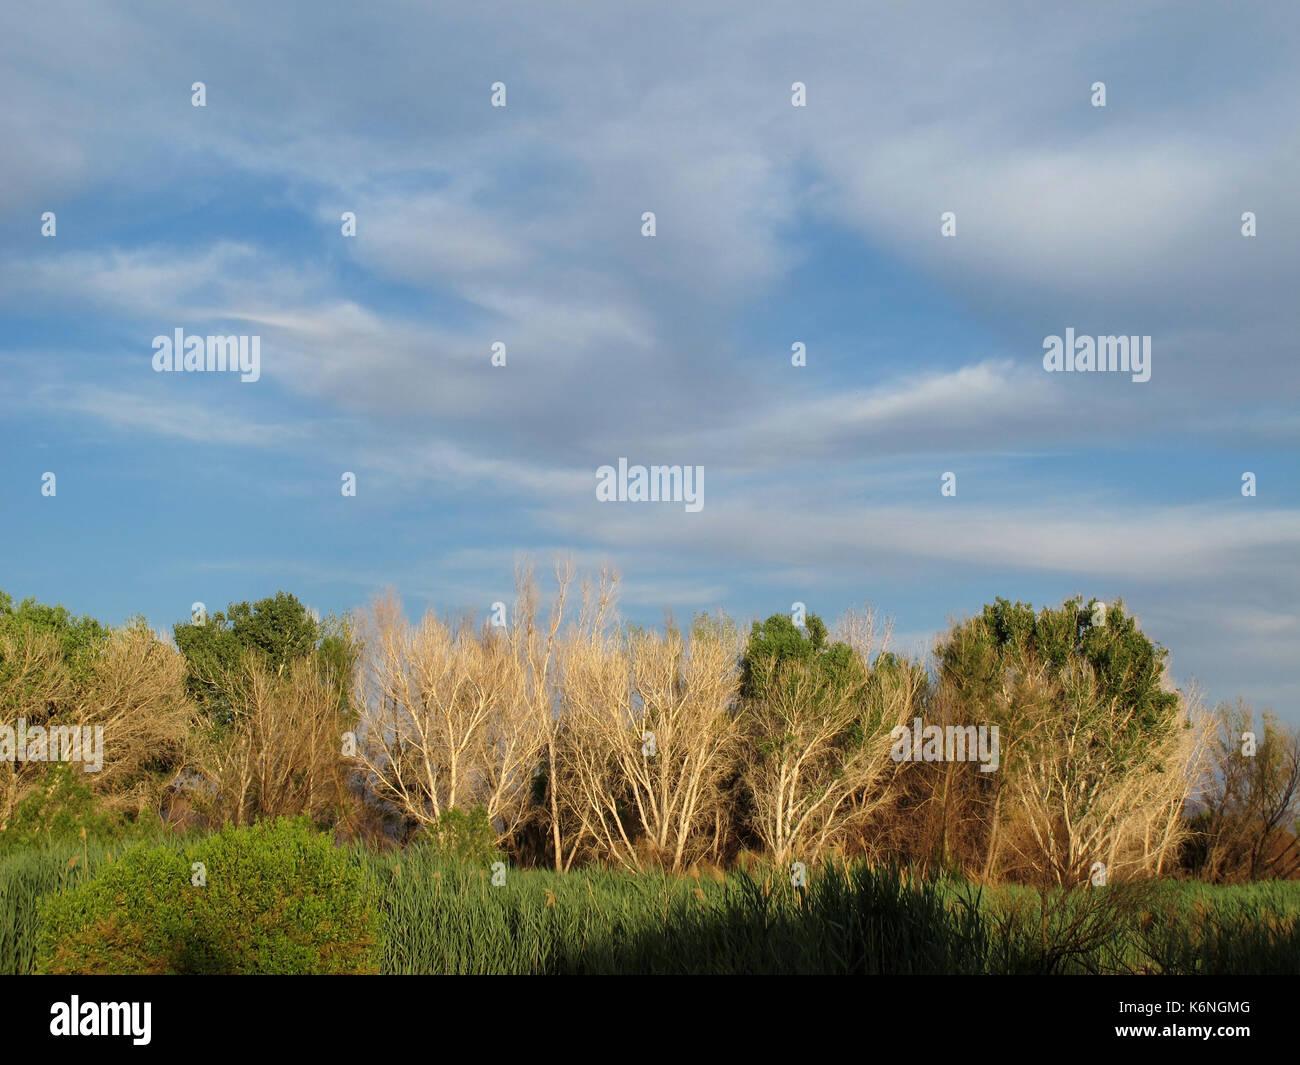 Clark County Wetlands Park, Las Vegas, Nevada - Stock Image